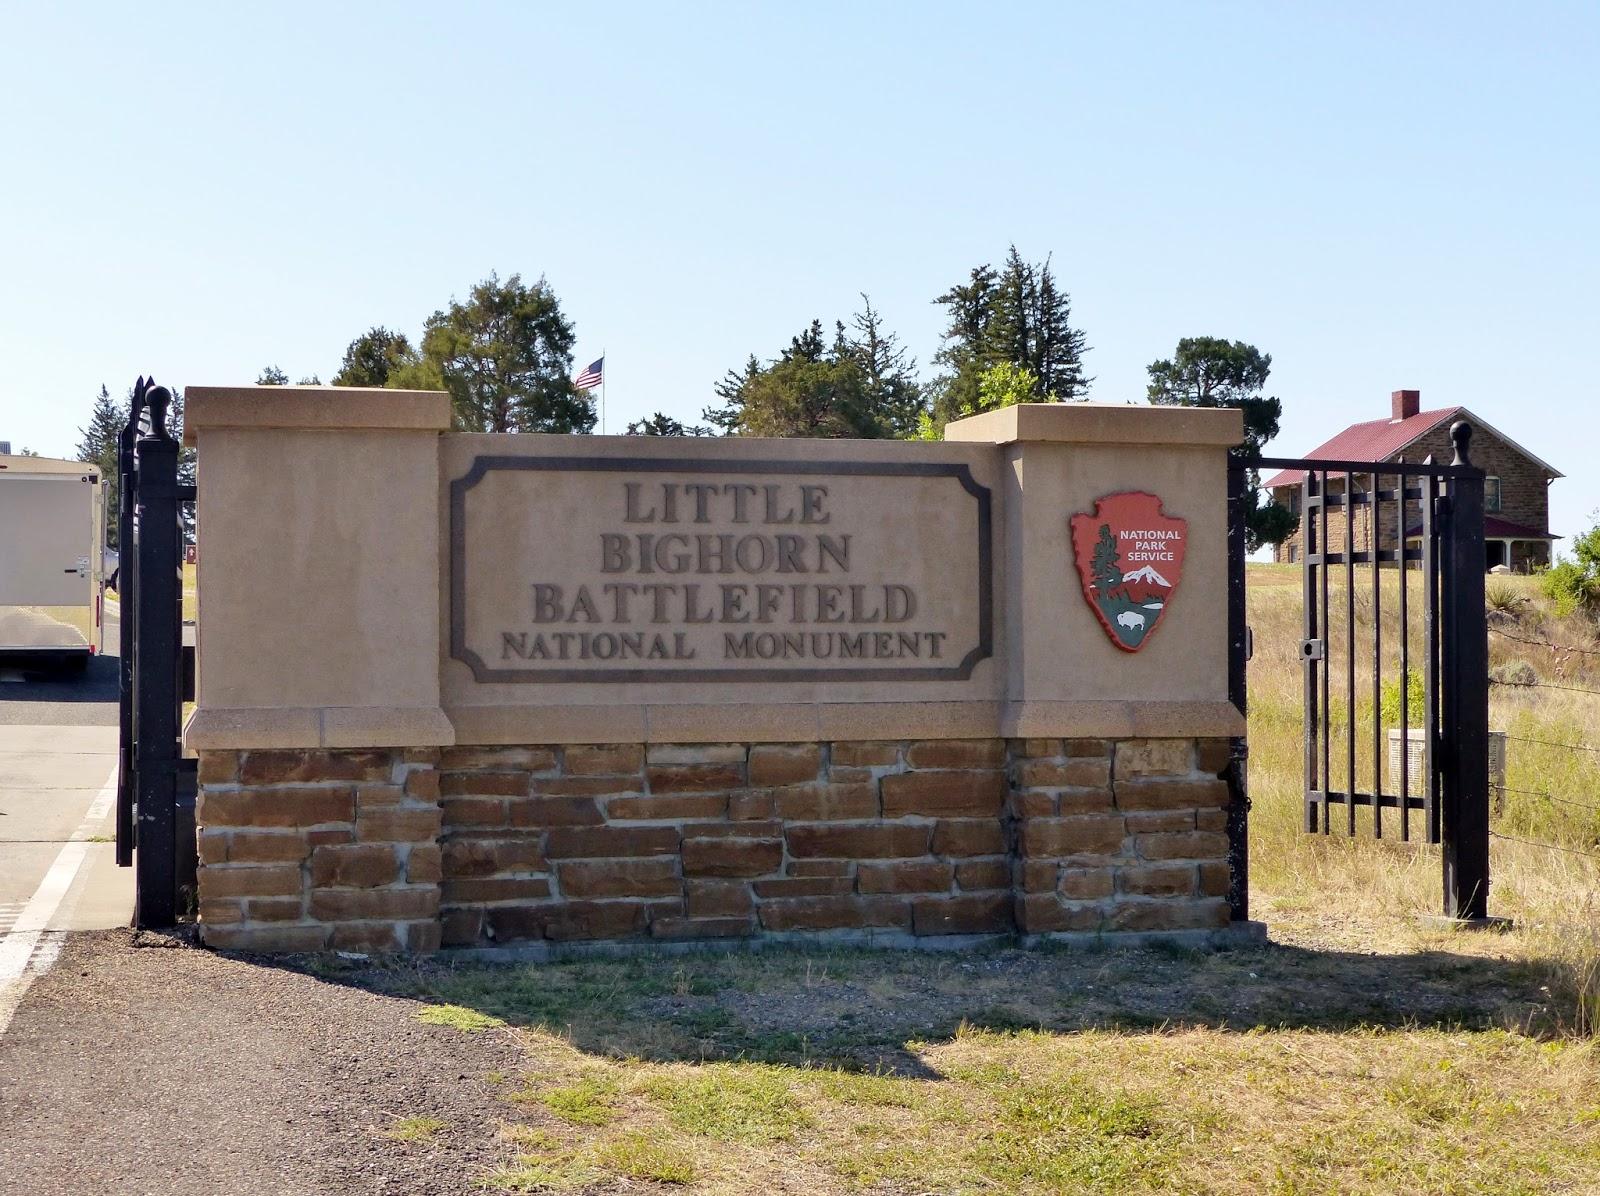 Entrance to the Little Bighorn Battlefield